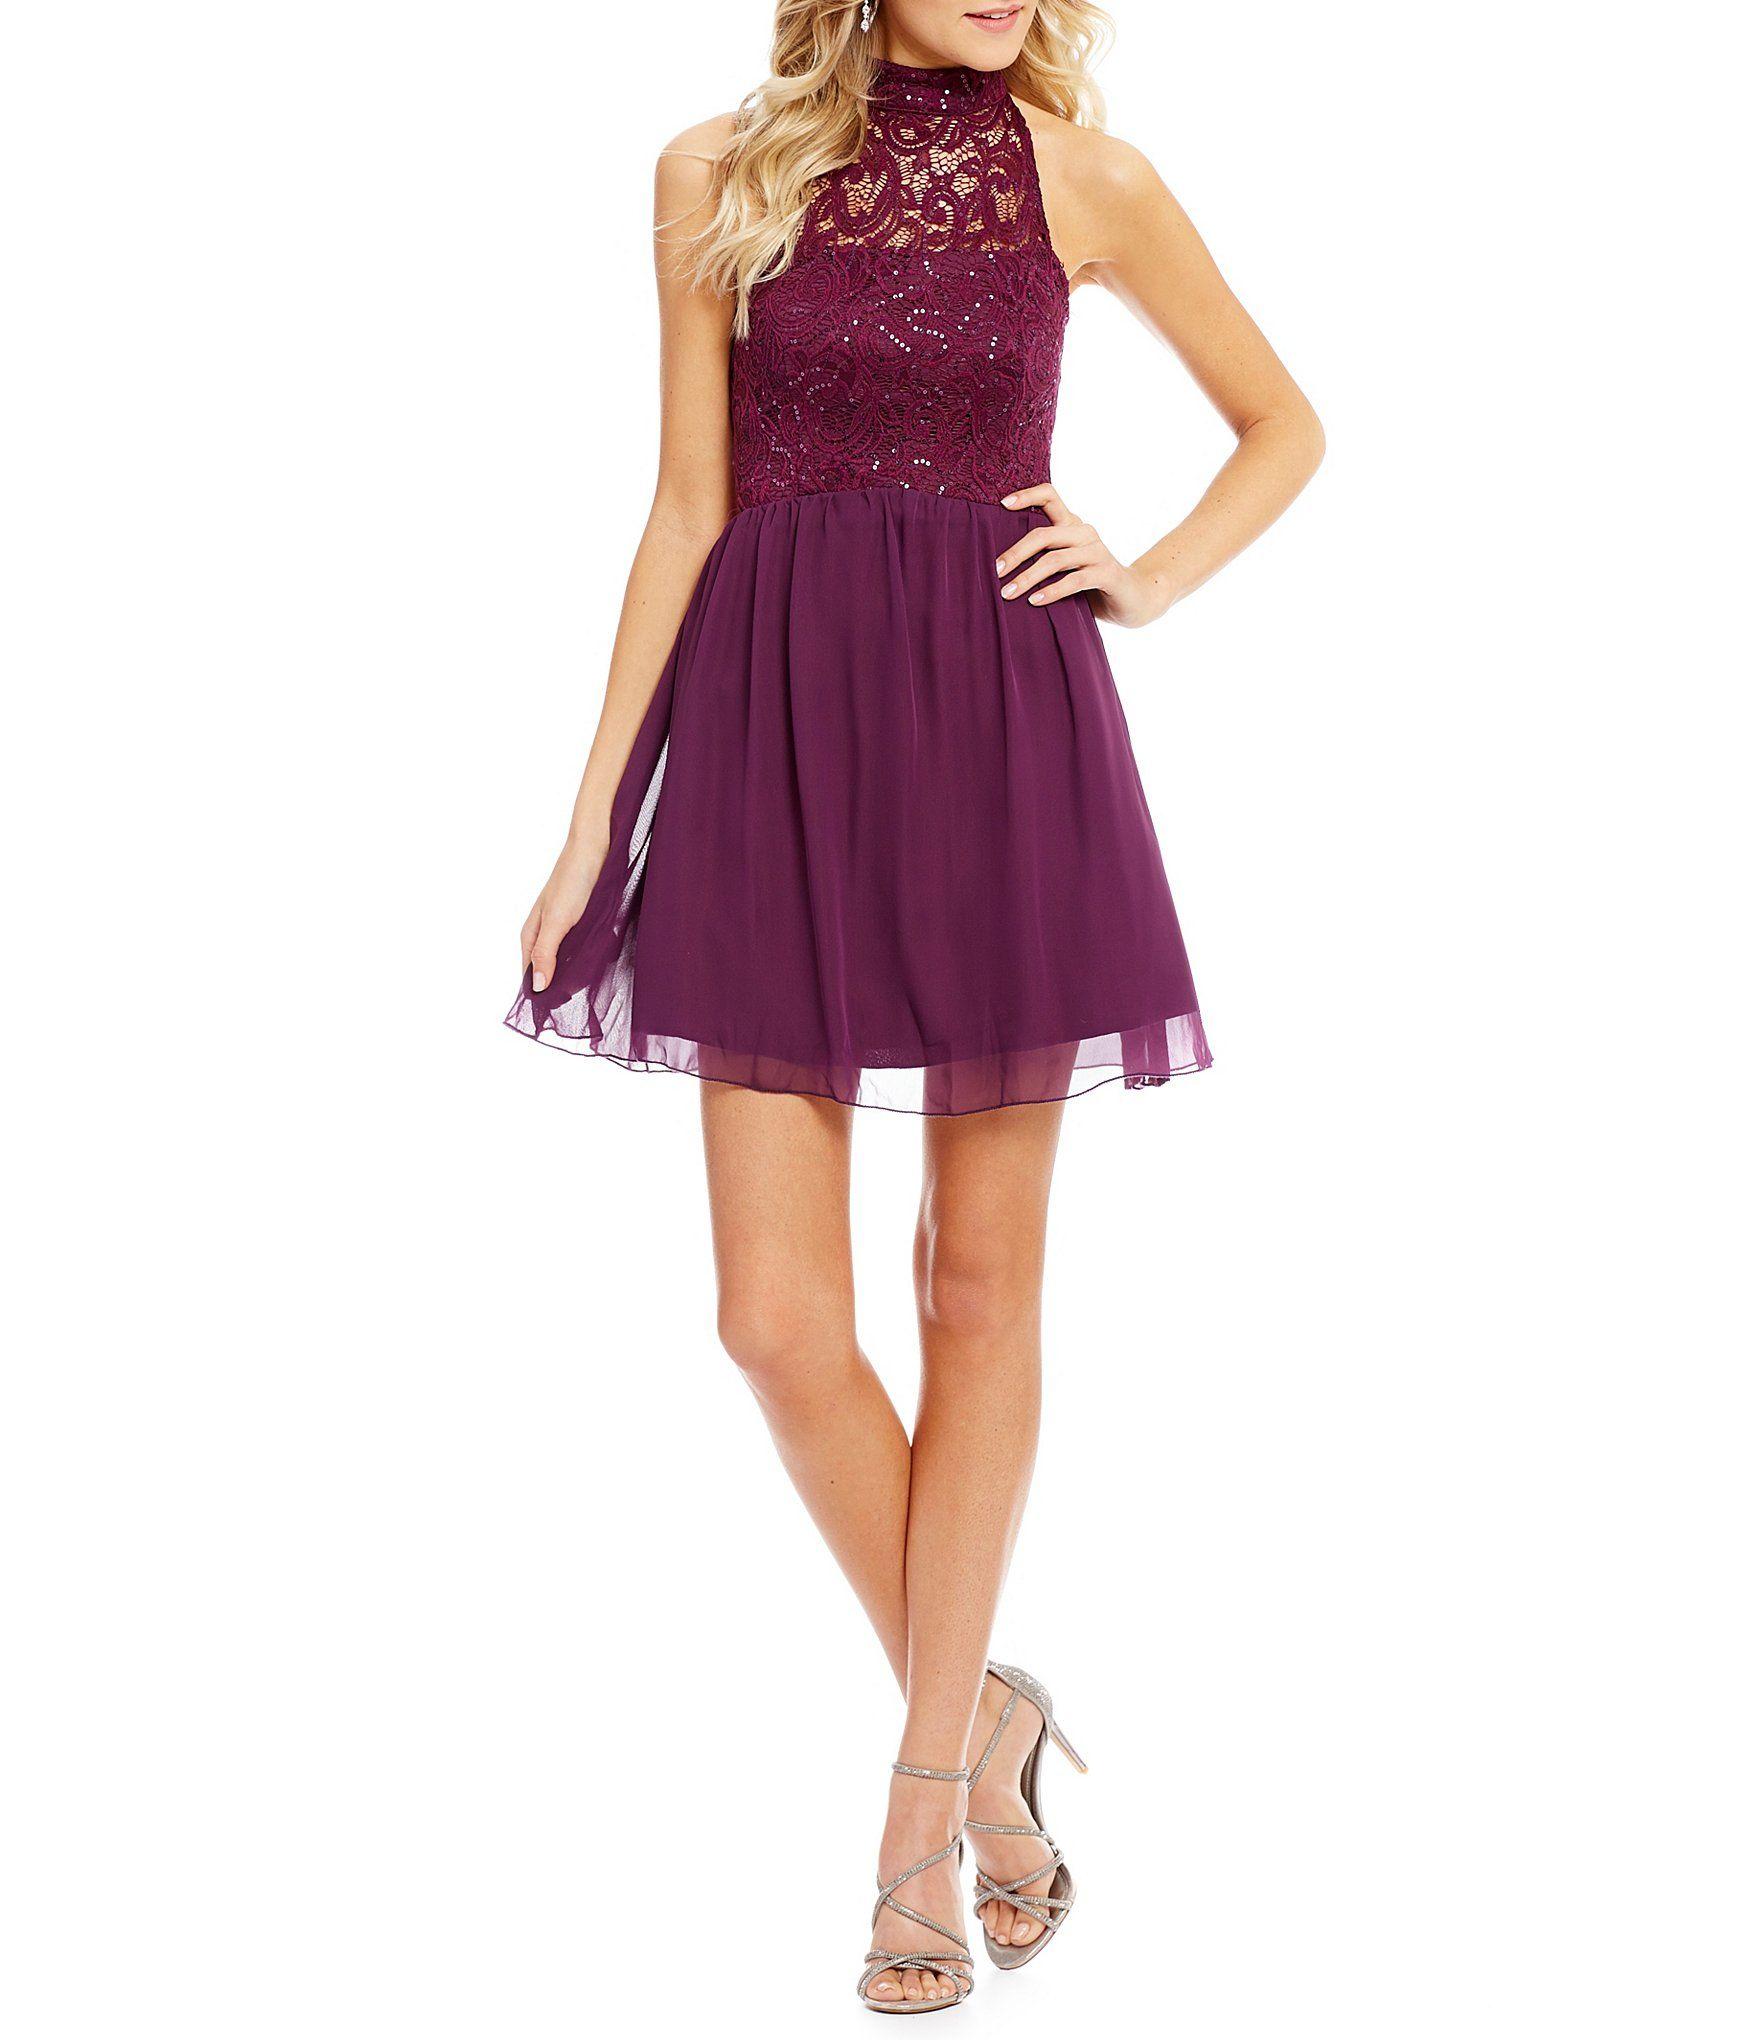 64231e7e67a Xtraordinary Mock Neck Sequin Lace Bodice Skater Party Dress  Dillards